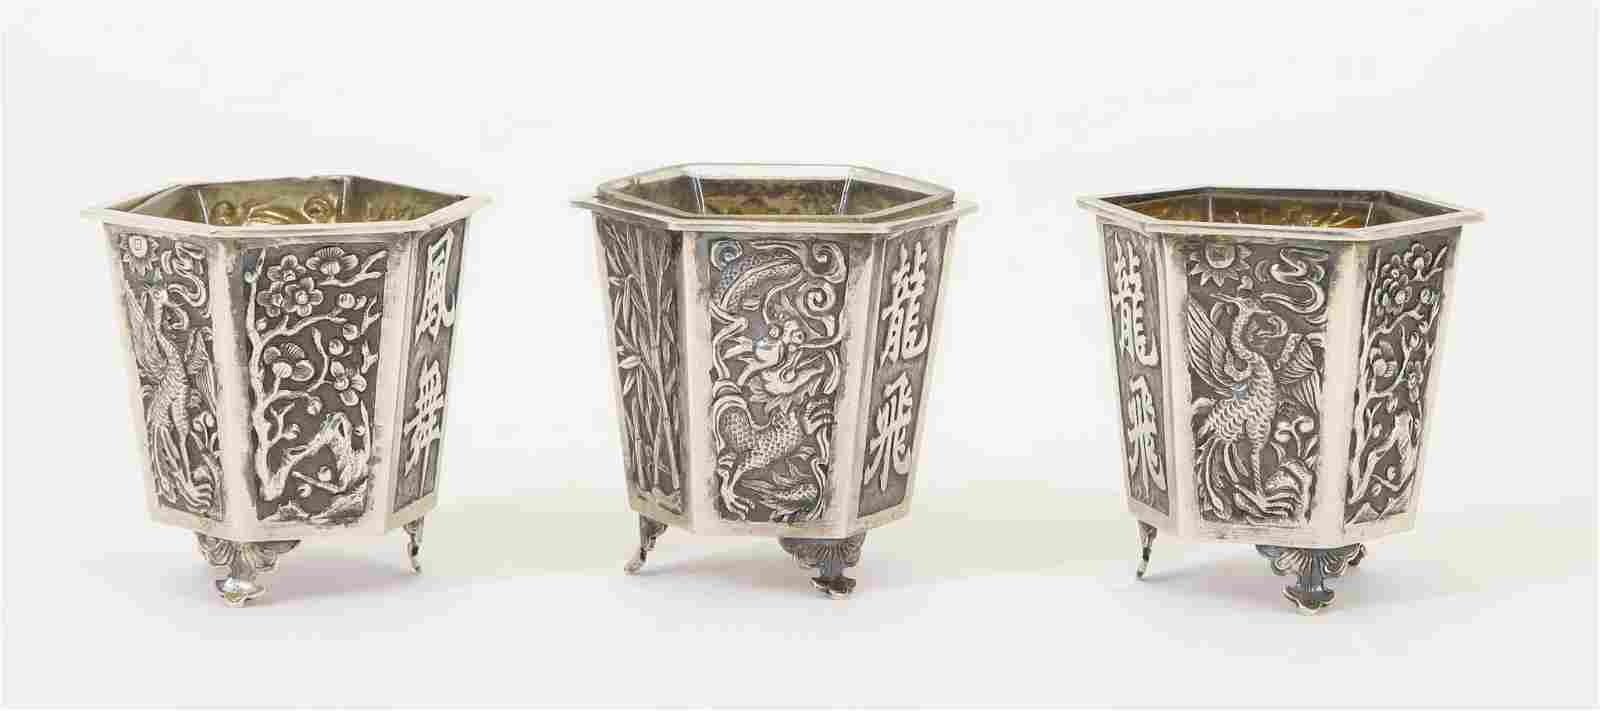 Wang Hing Sterling Silver Sake Cups